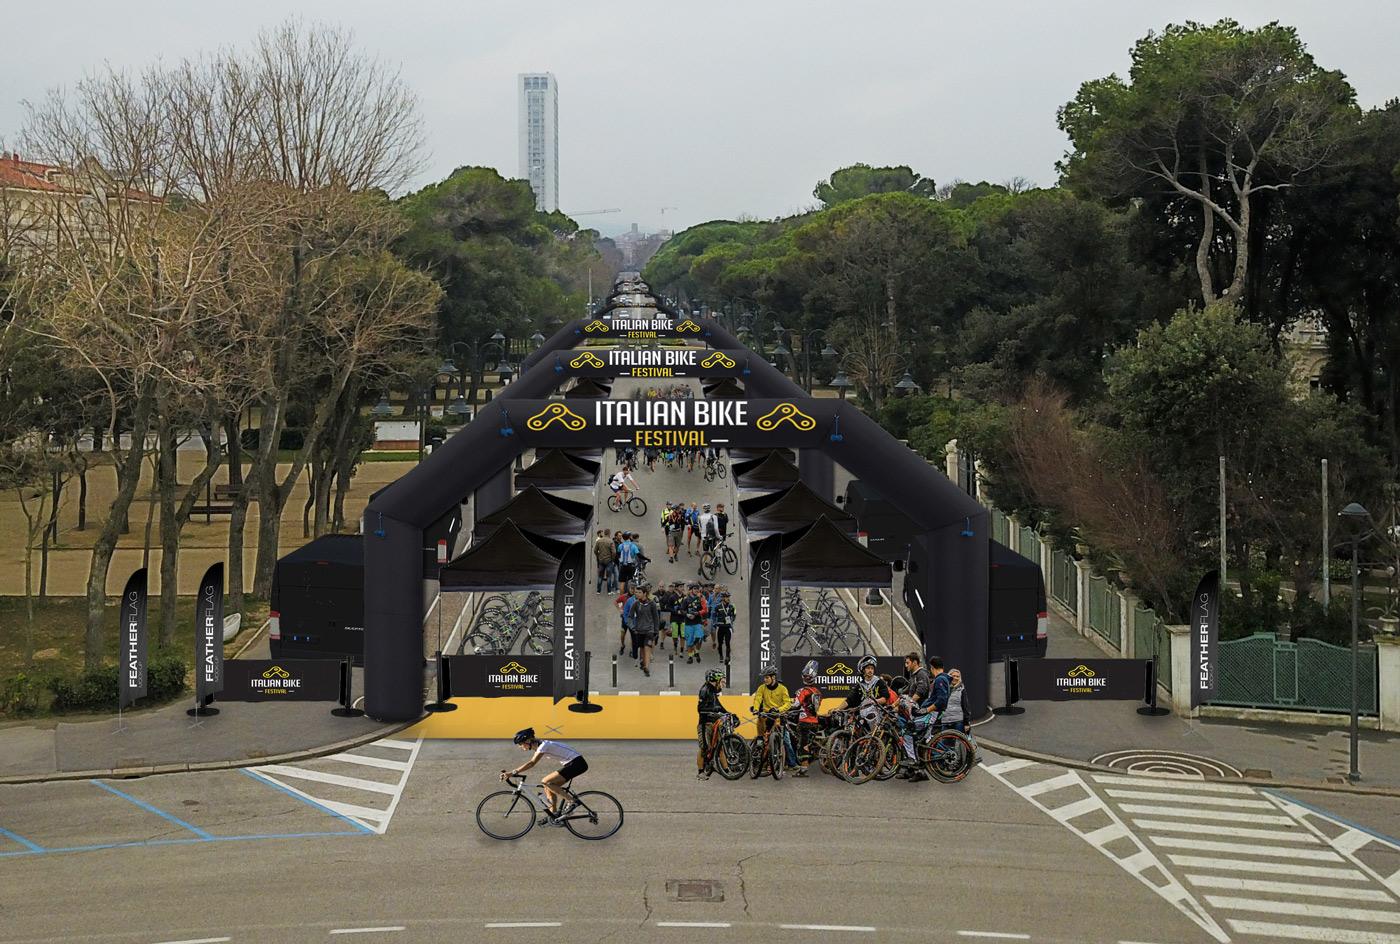 Italian Bike Festival breaking news